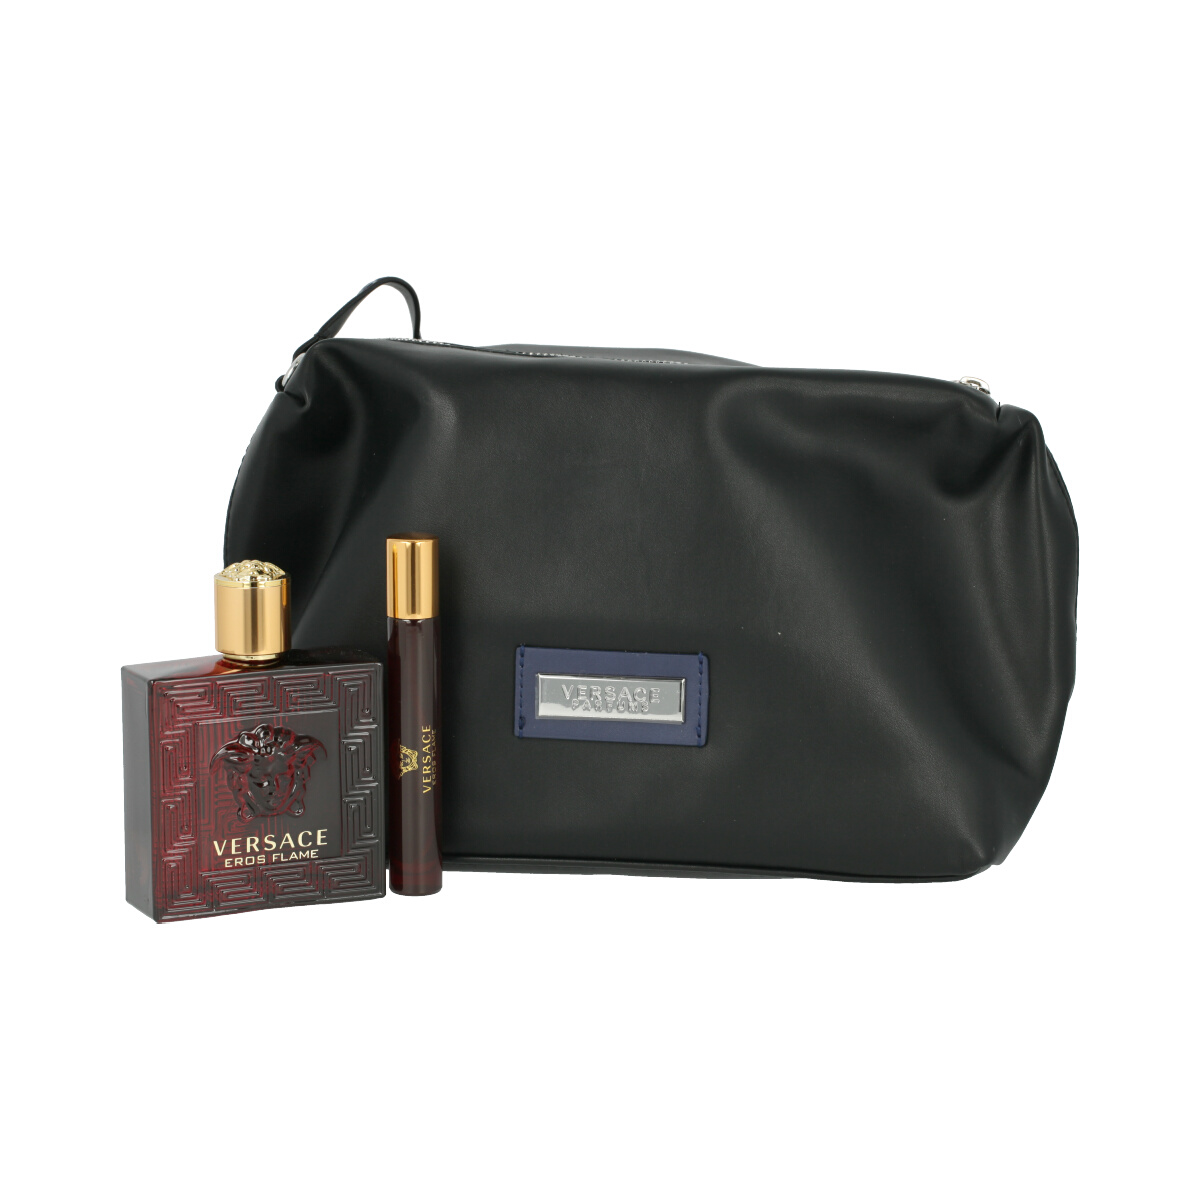 Versace Eros Flame EDP 100 ml + EDP MINI 10 ml + Kosmetiktasche (man) 18967